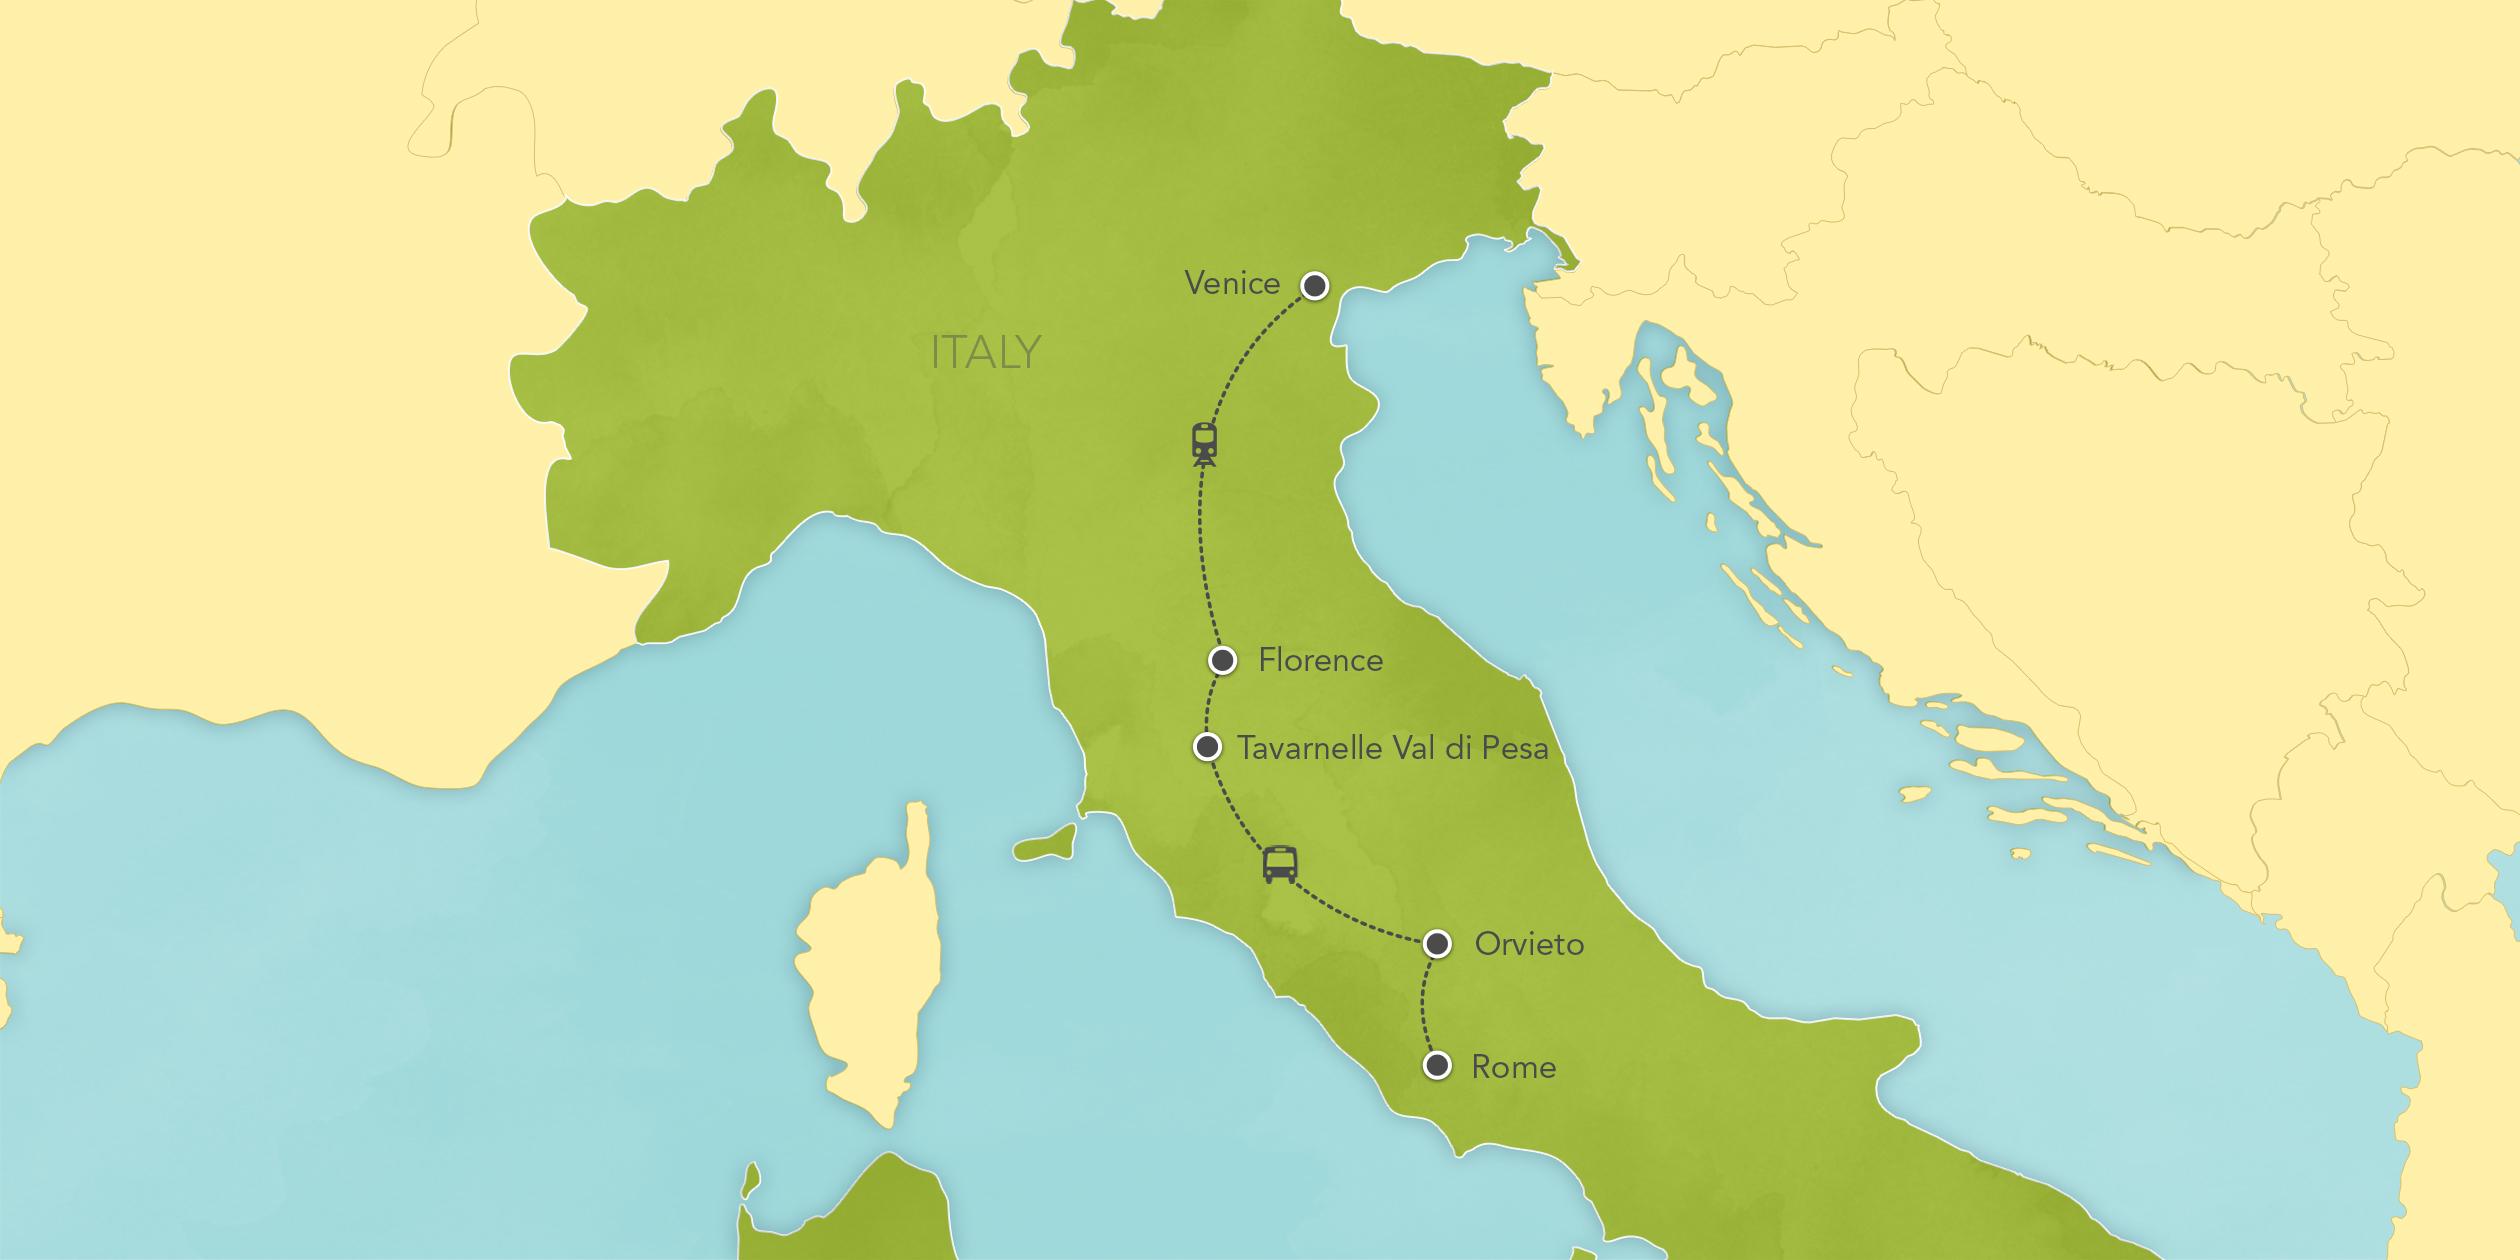 Itinerary map of Italy: Rome, Florence, Tuscany, Venice 2018